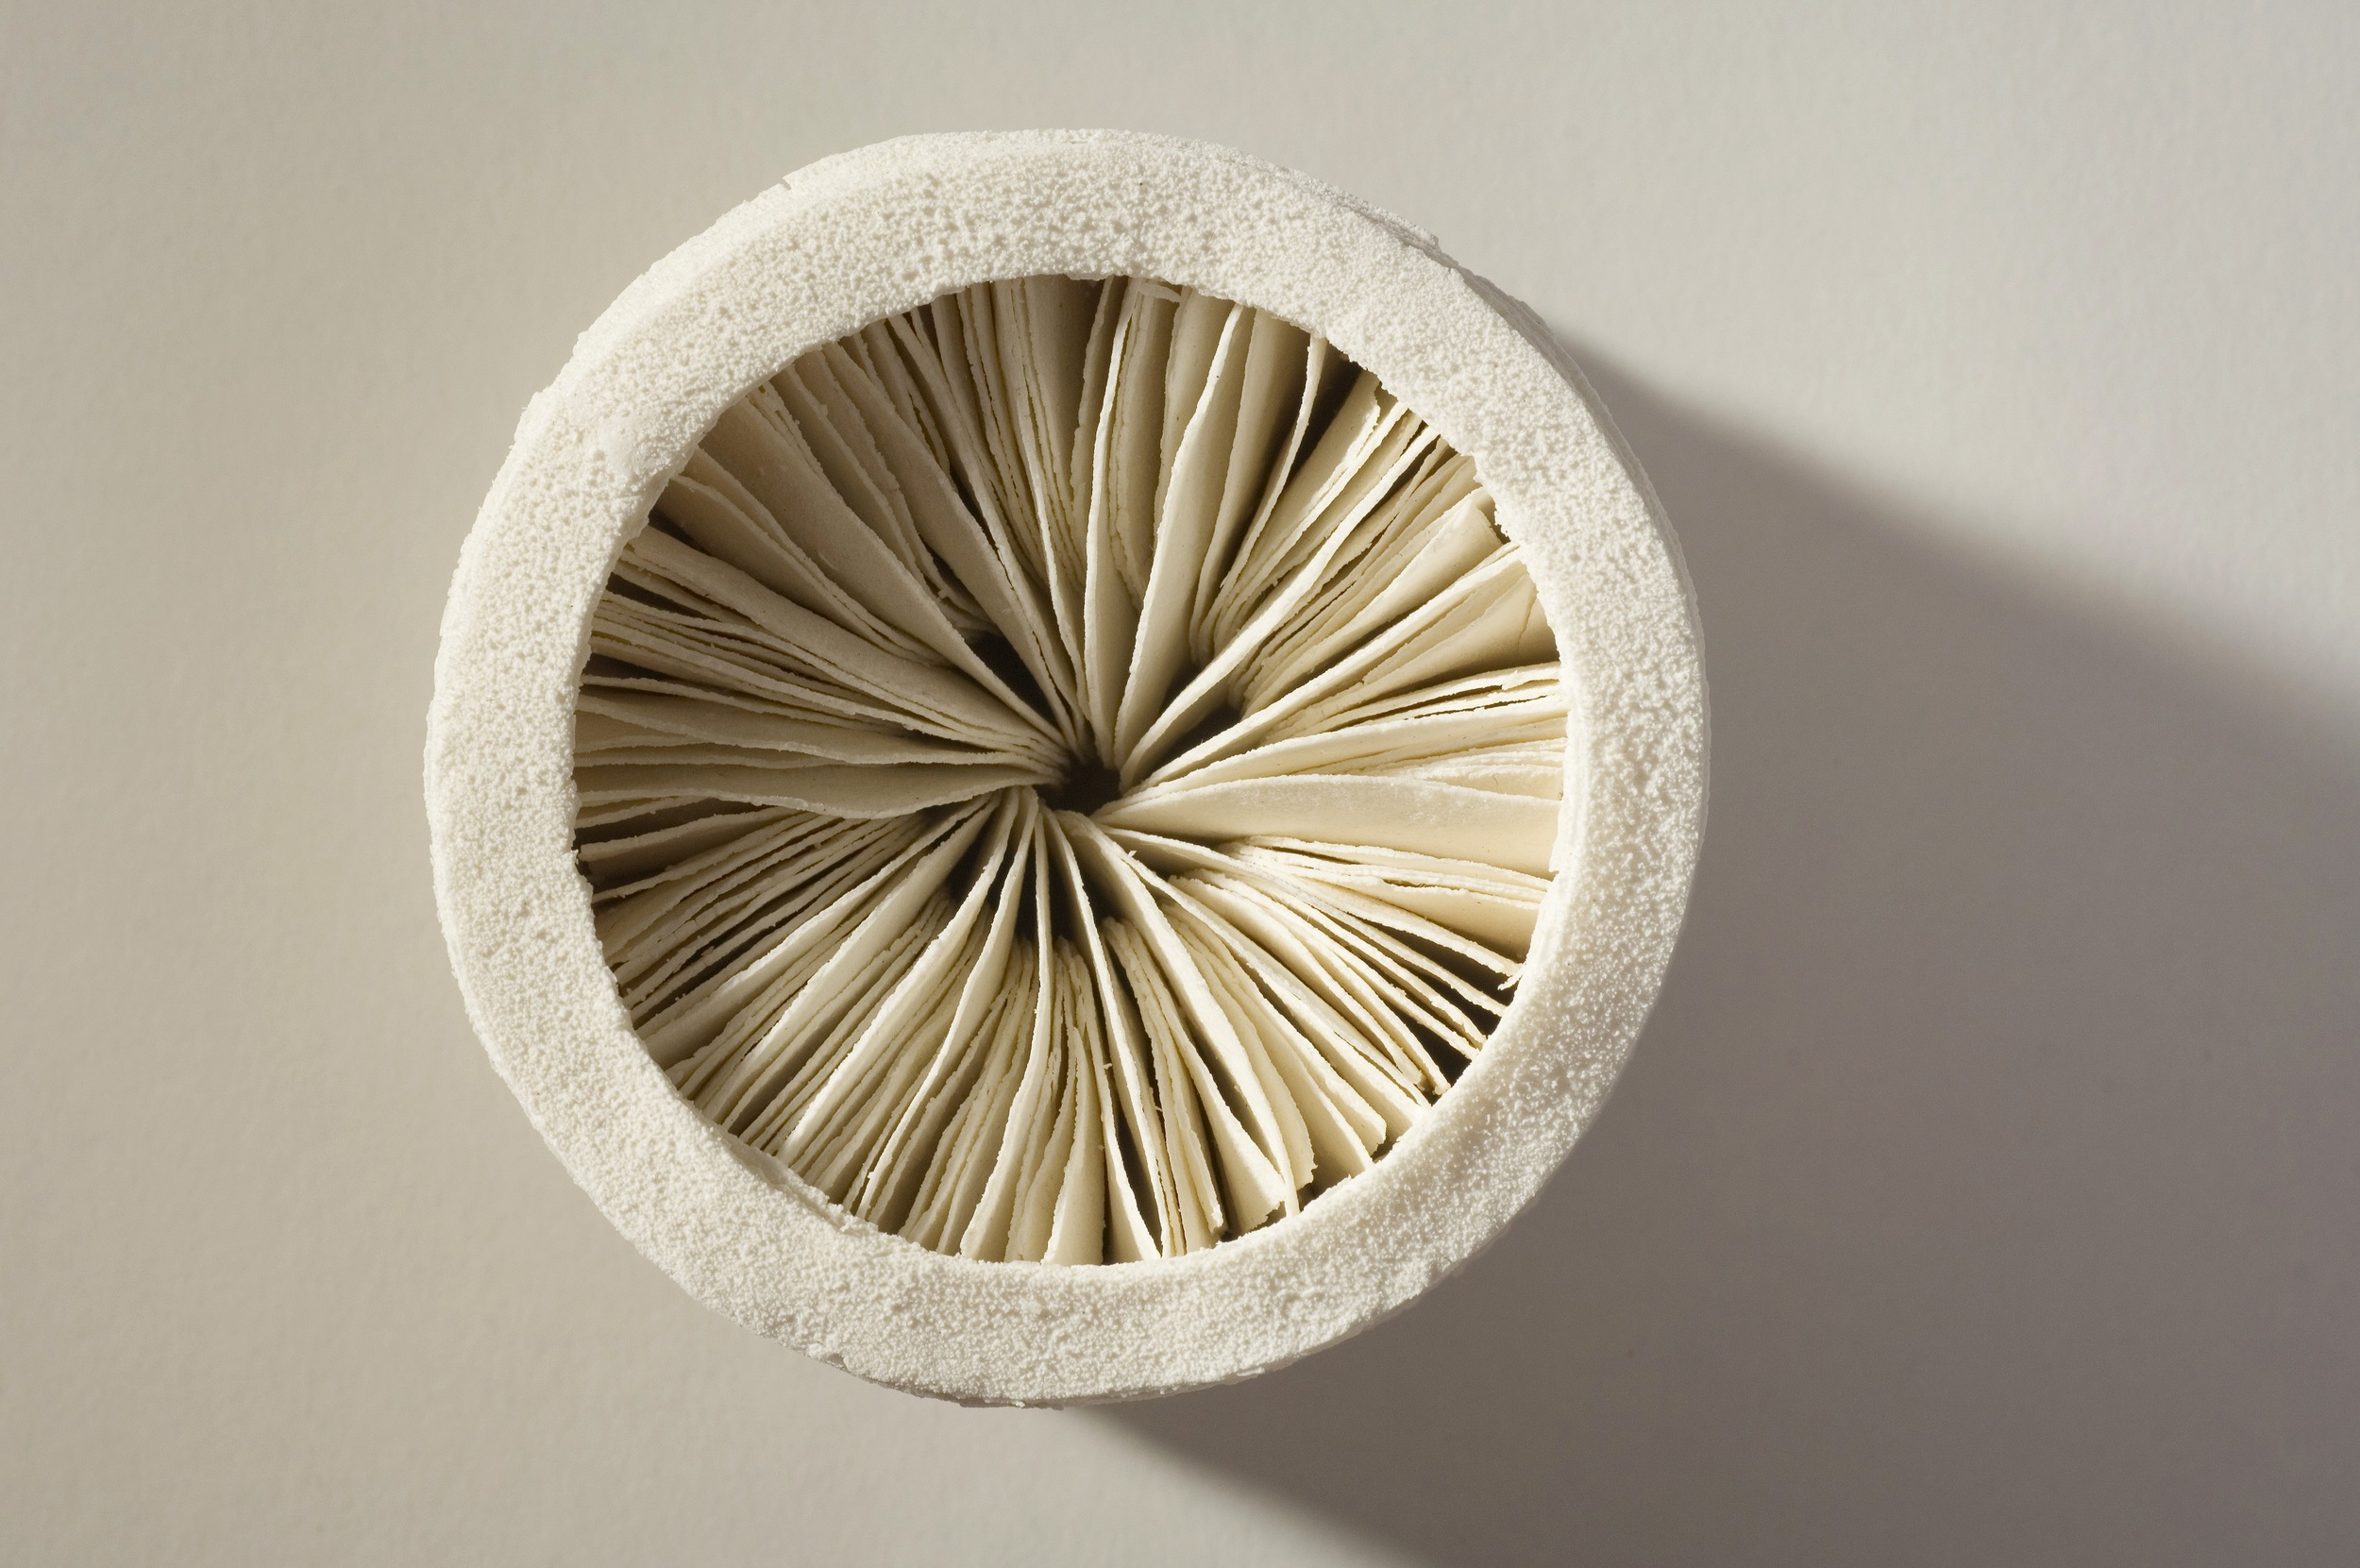 Interior Series,  2006, artist blend glaze material, 9cm x 8cm x 8cm